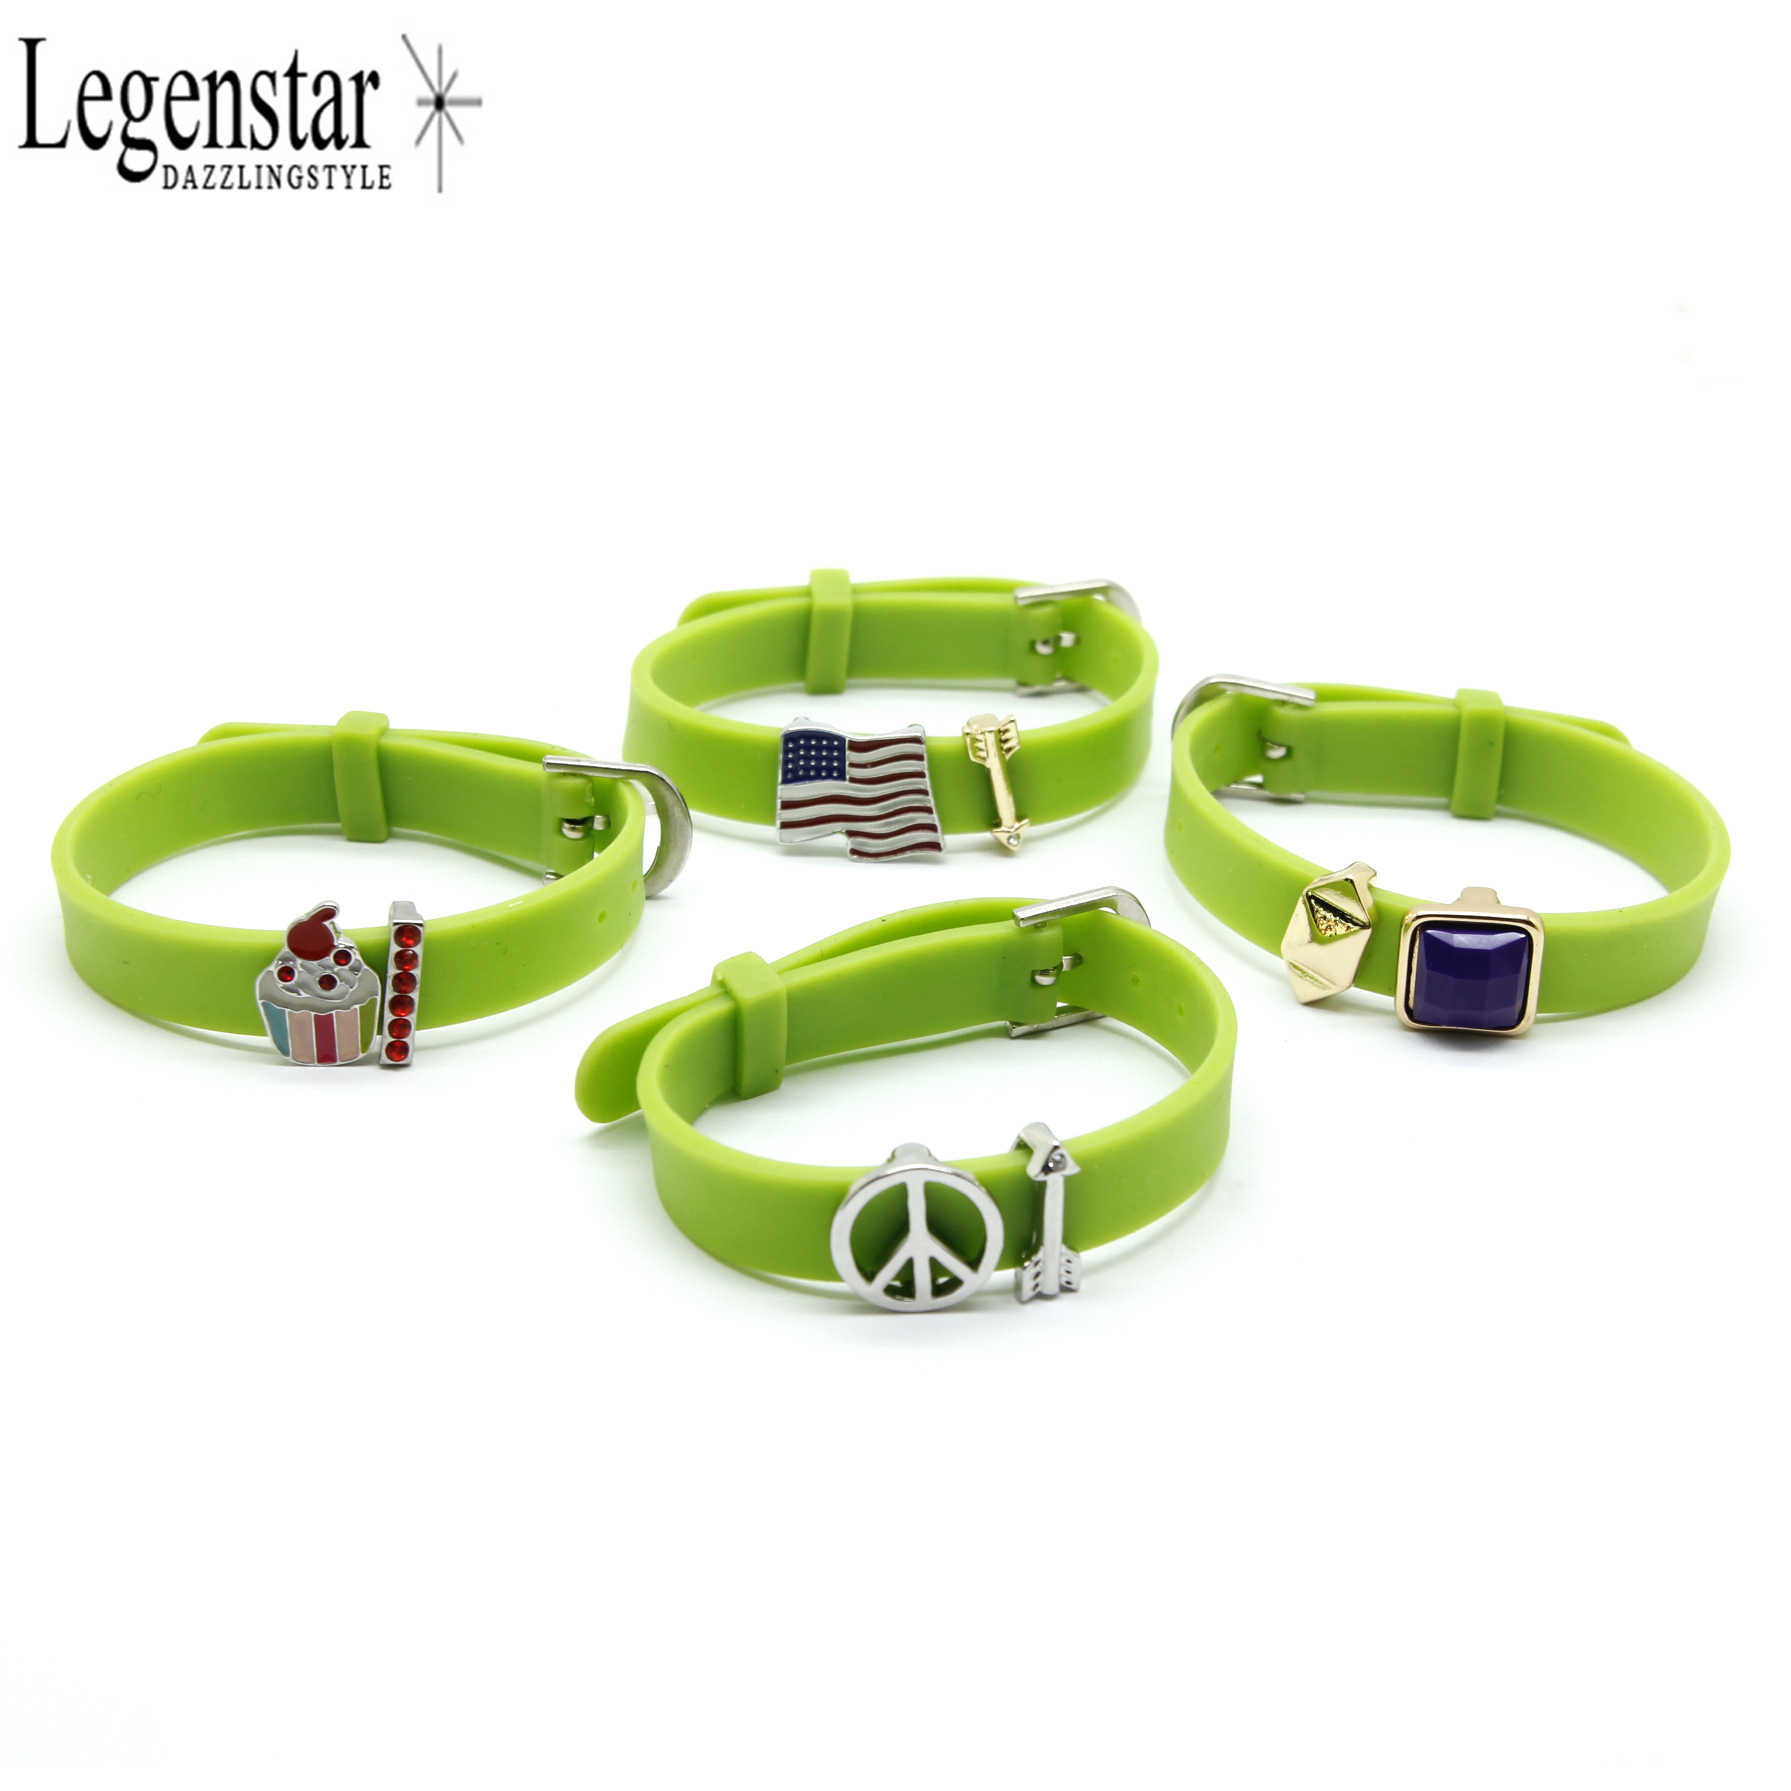 Legenstar Keeper Slide Charm Bracelets